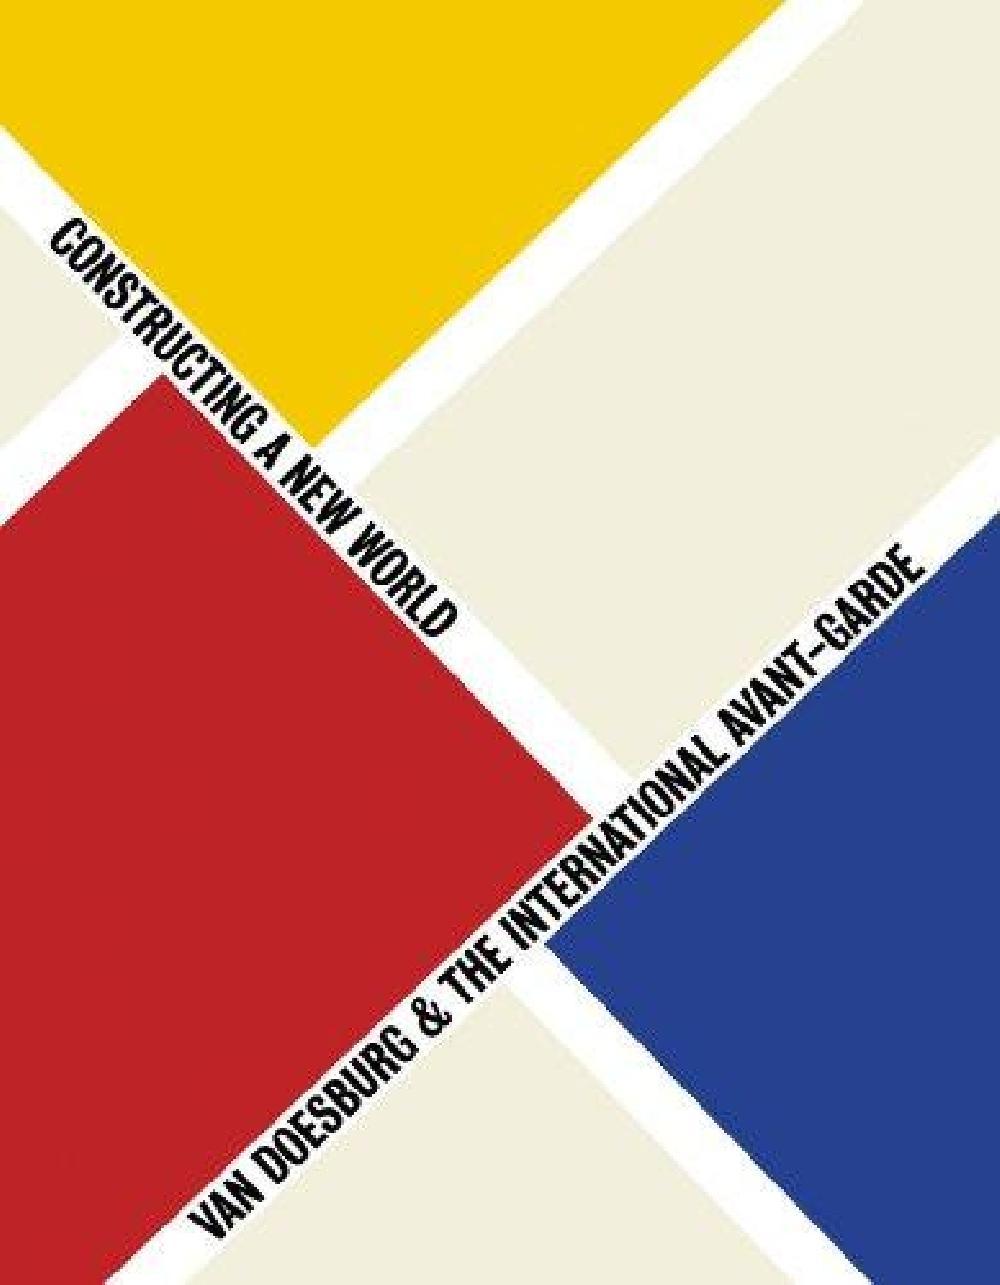 Stock Image Van Doesburg & the International Avant-Garde: Constructing a New World